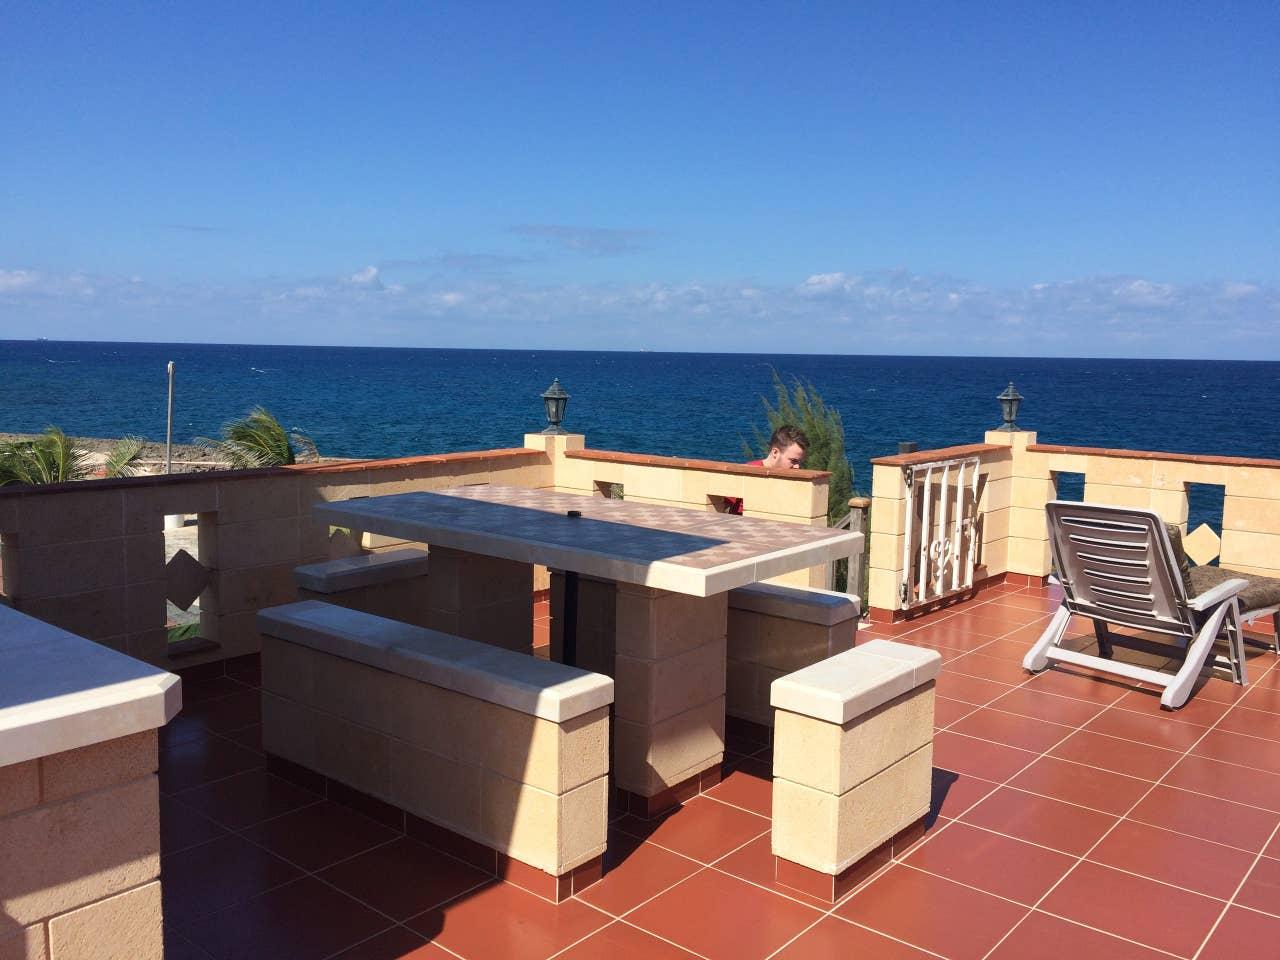 Apartment Casa Oceanview 3 - Luxury   Amazing View photo 23408868